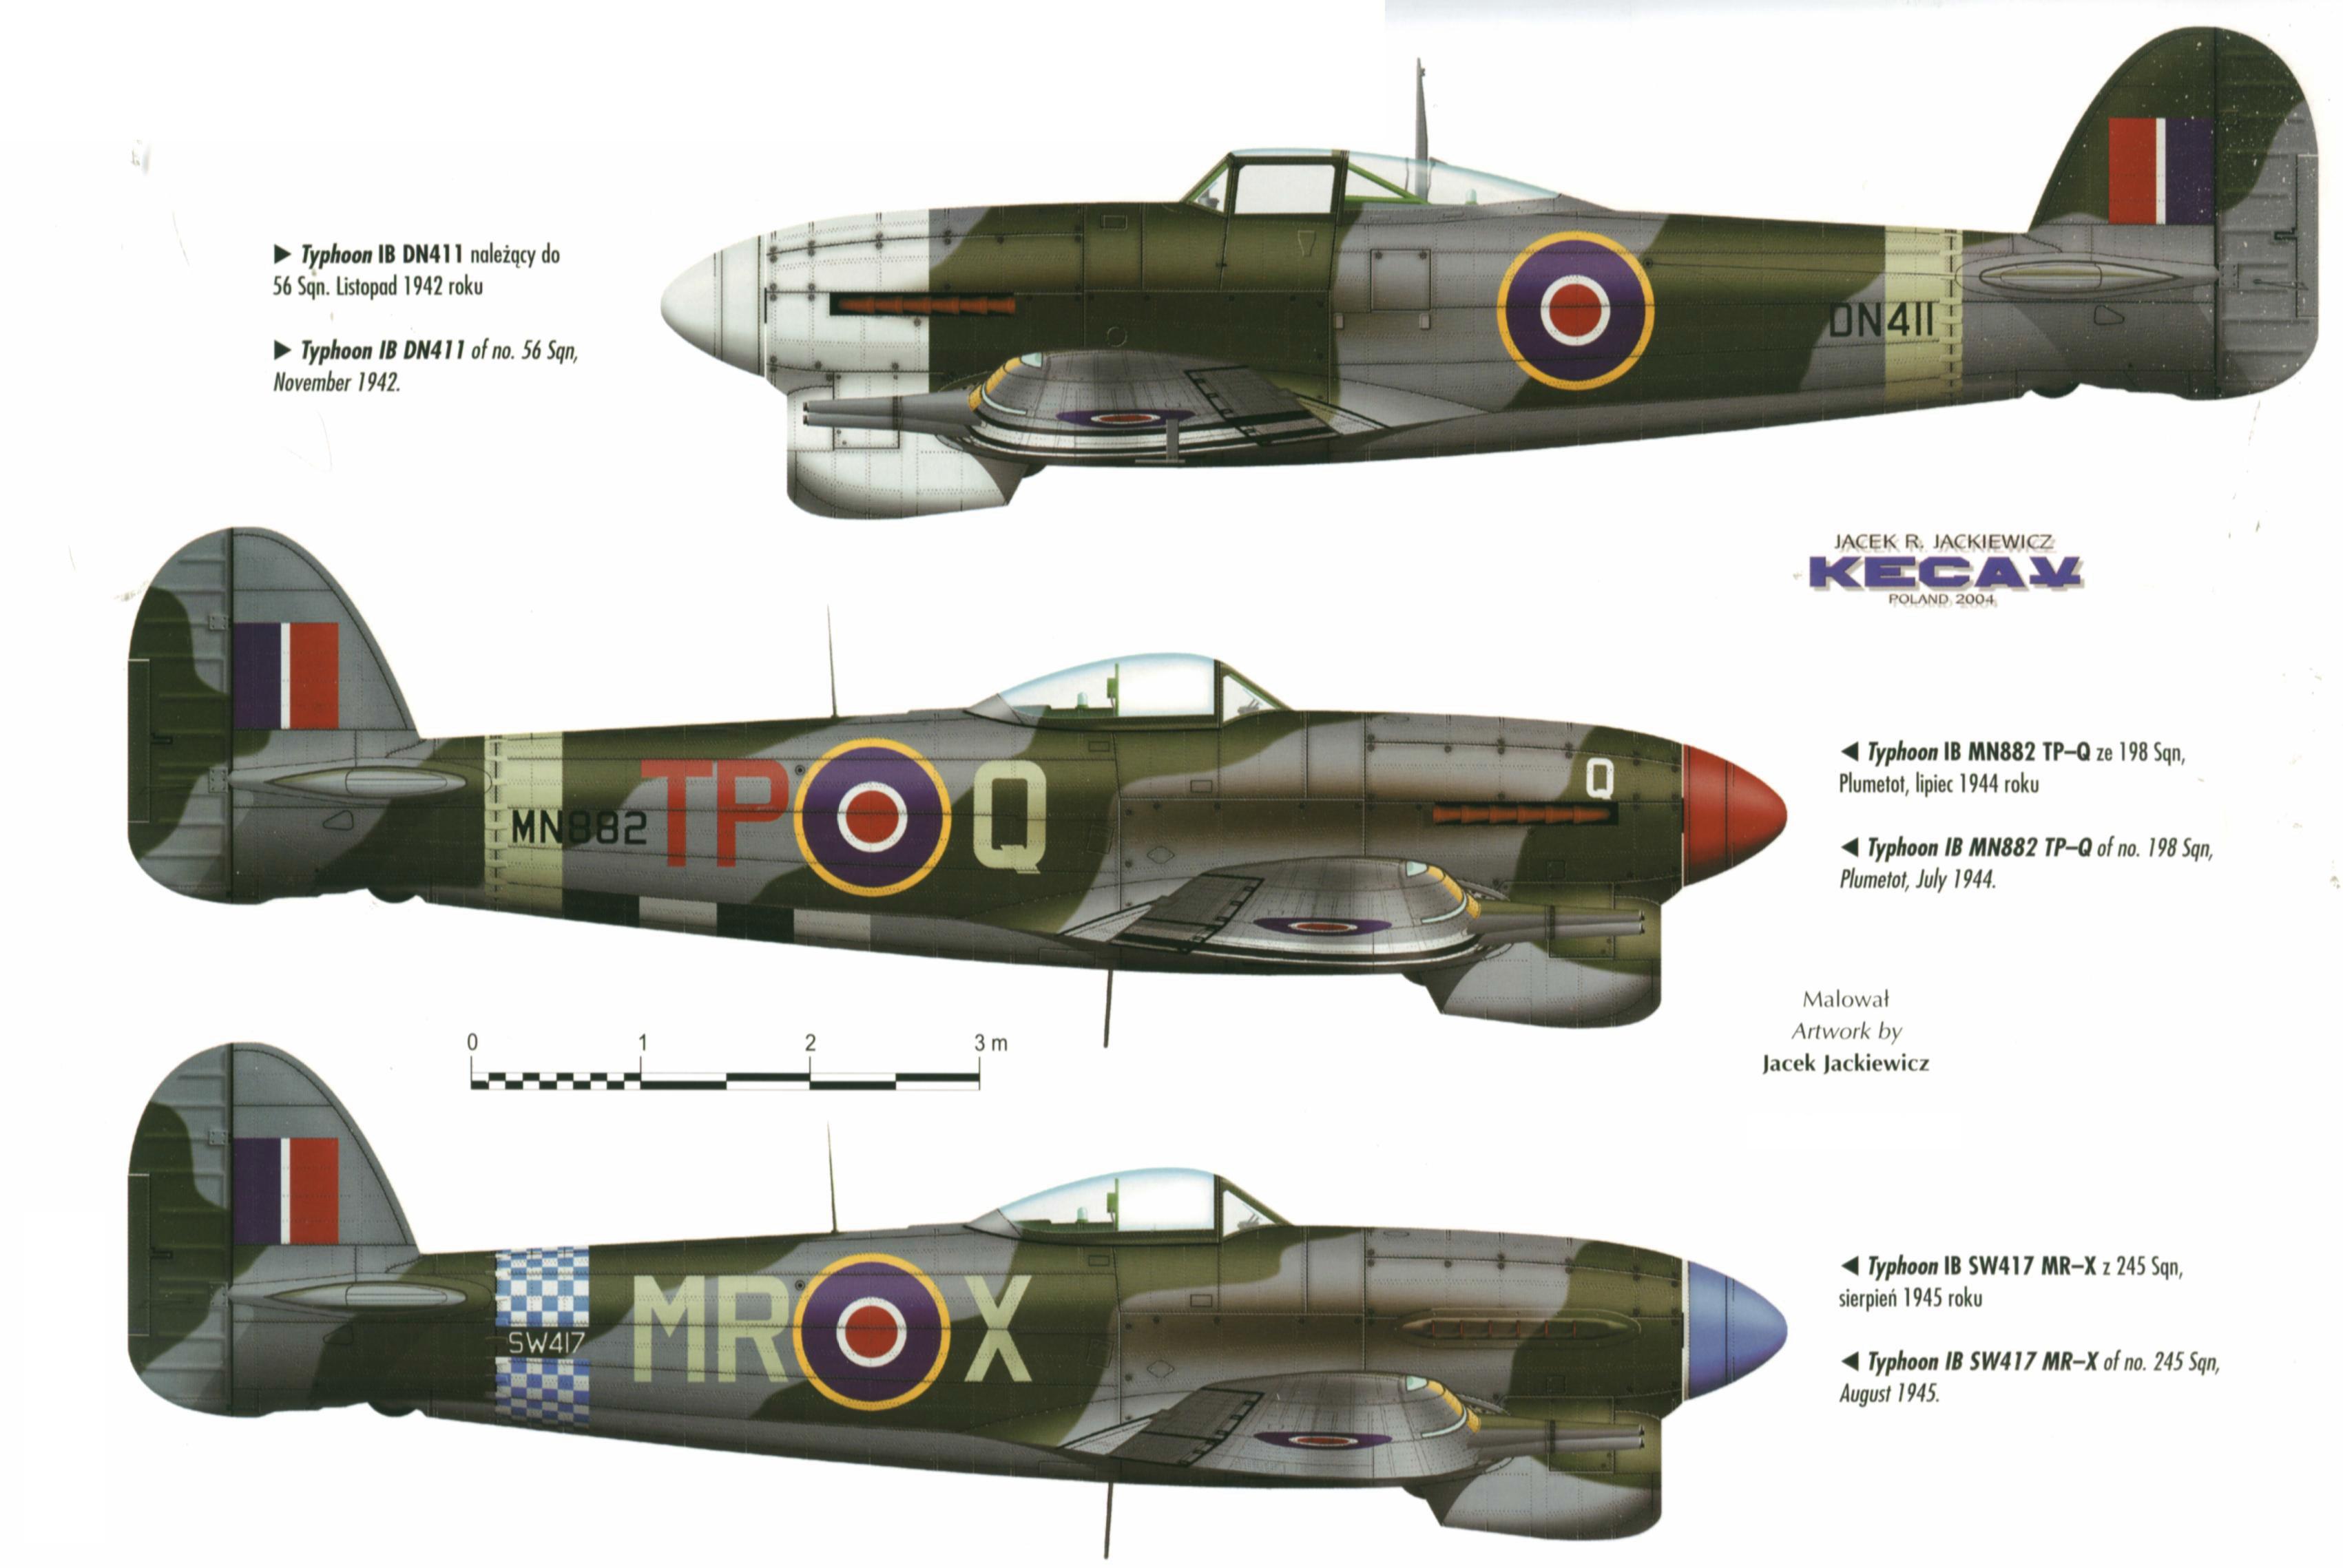 Hawker Typhoon Weapons And Warfare